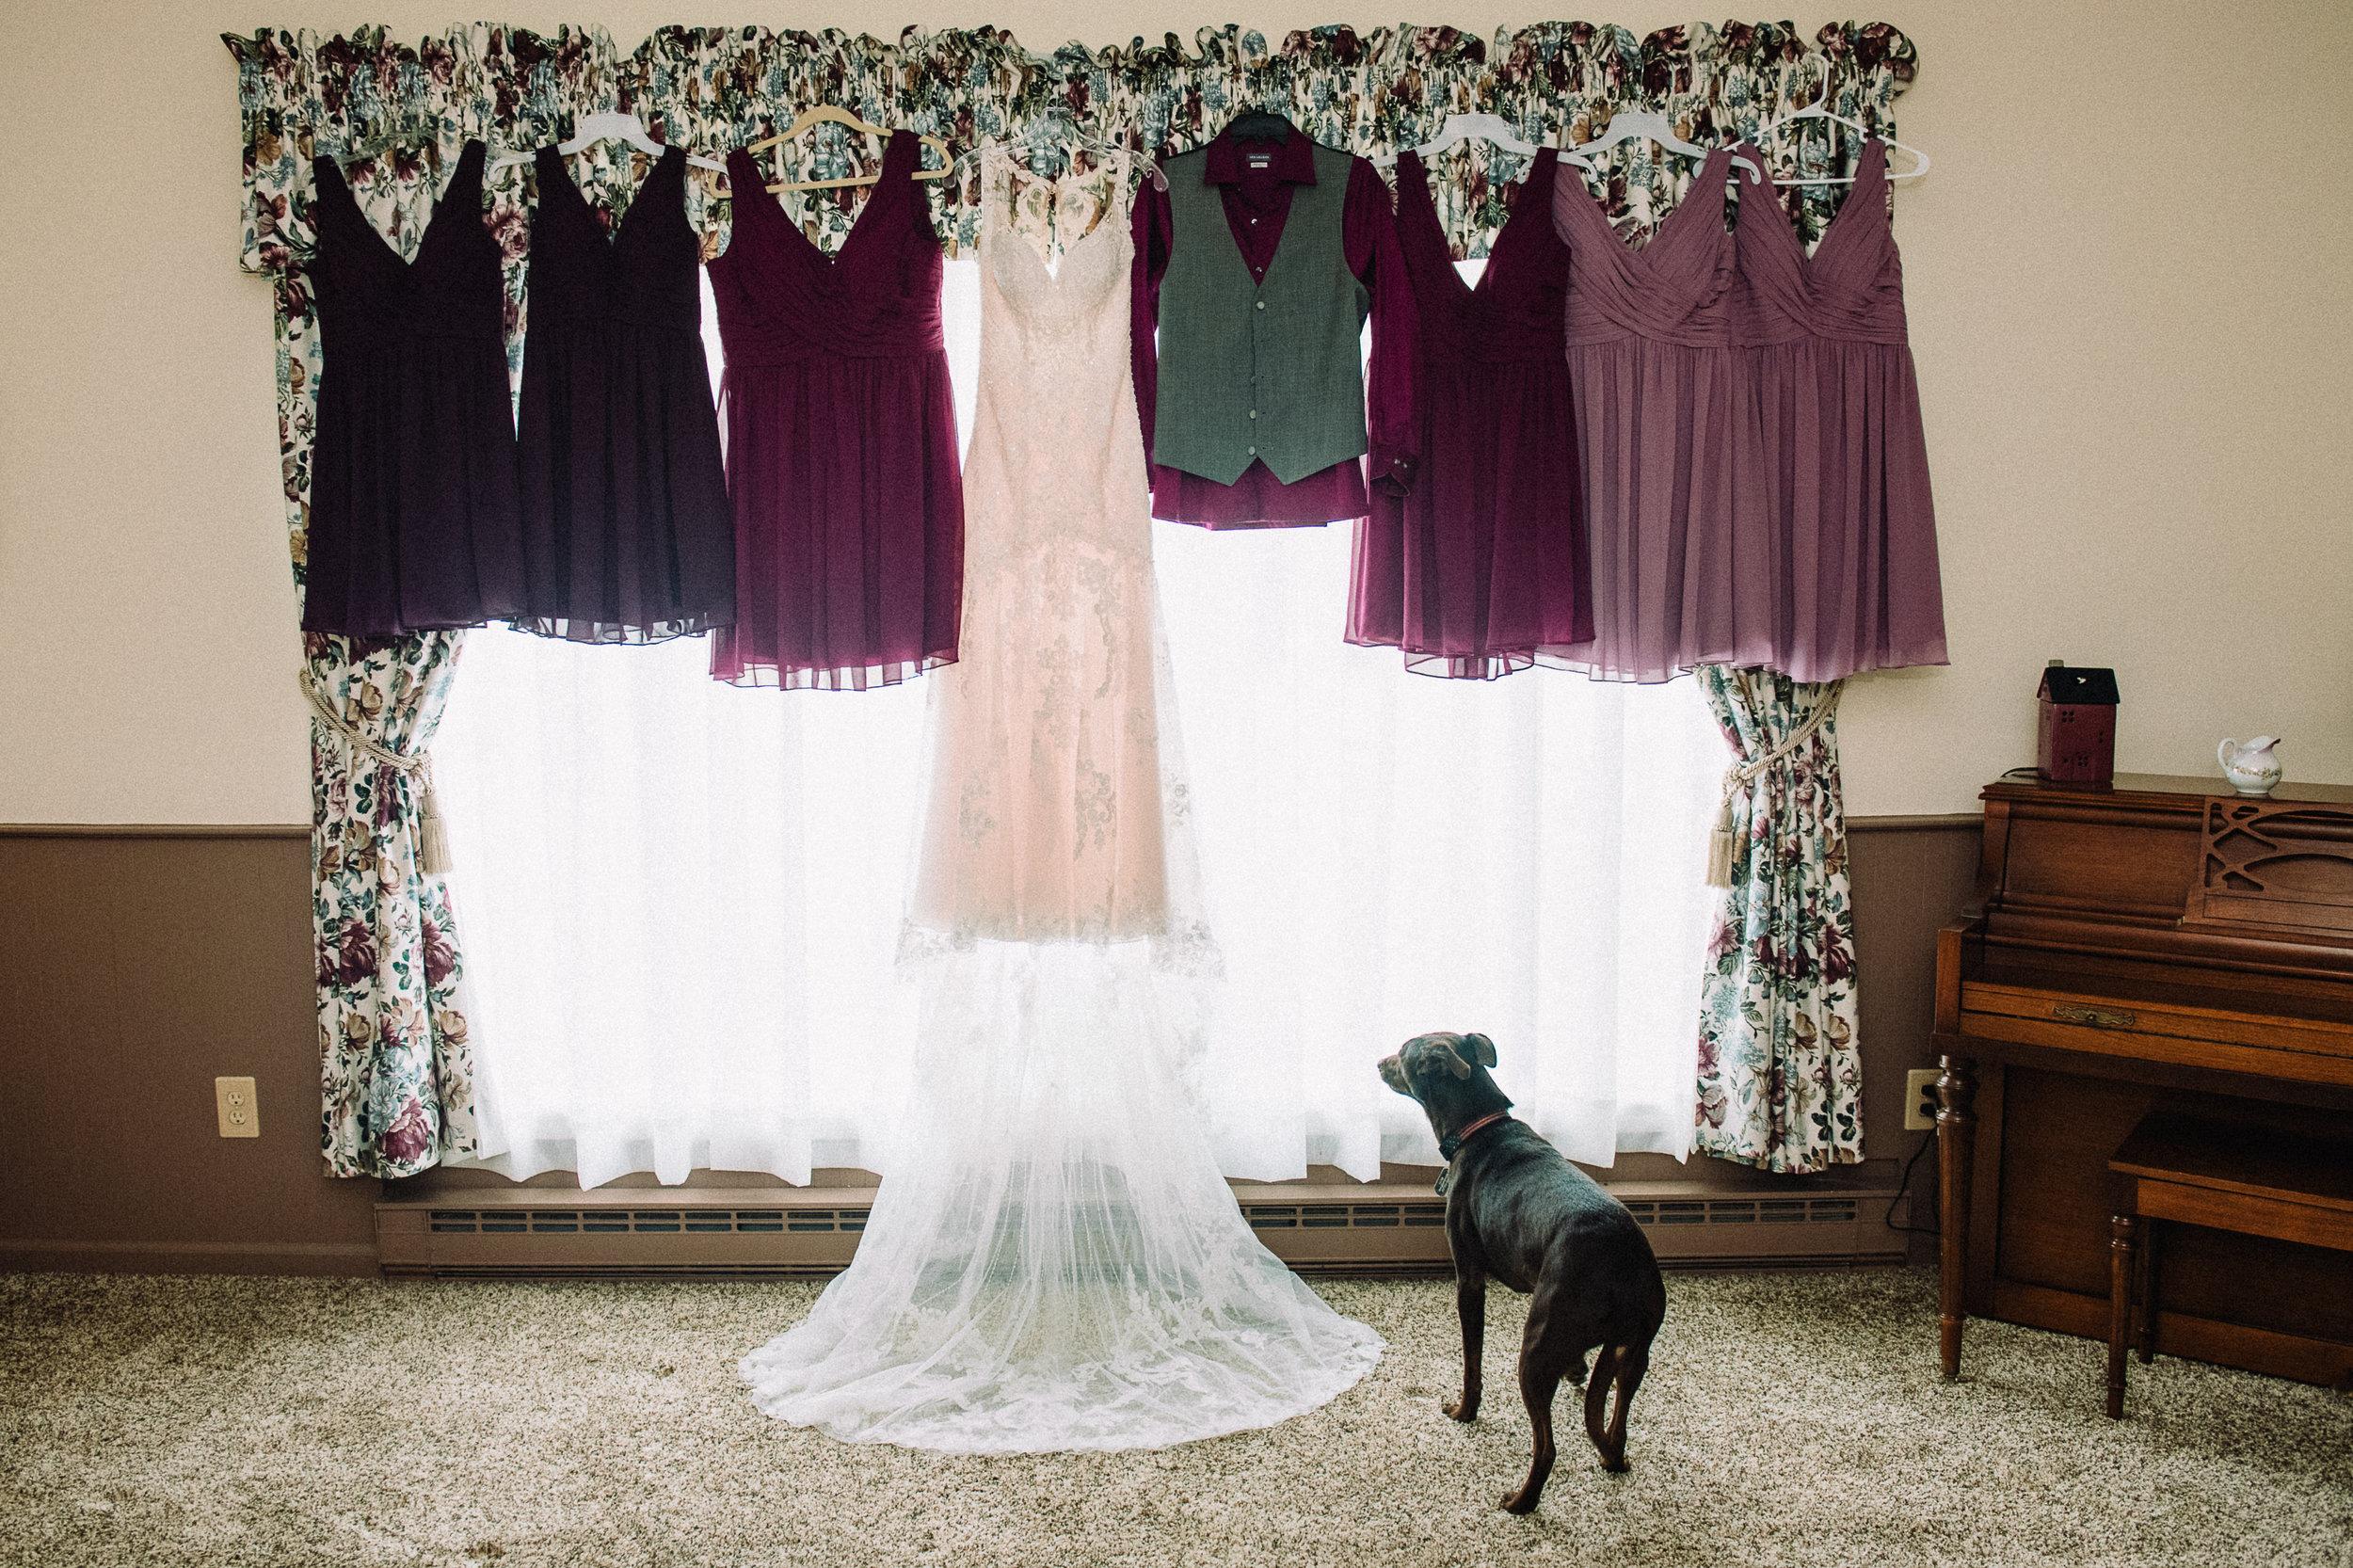 005ninalilyphoto-groveatkemptonwedding-hicksblog.jpg